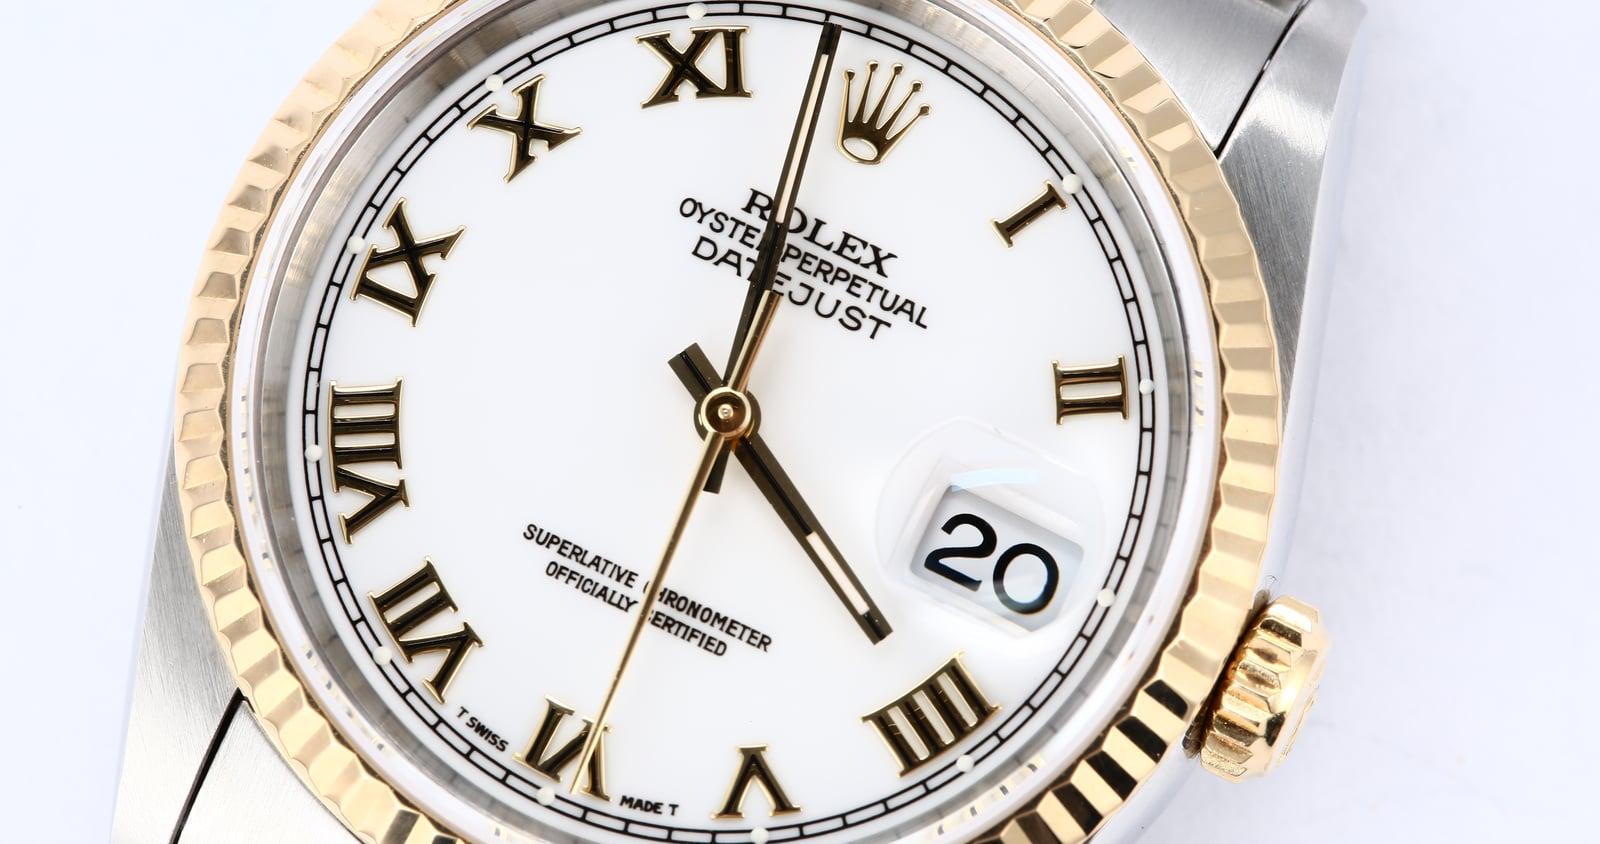 Rolex datejust 16233 white roman dial genuine rolex datejust 16233 white roman dial amipublicfo Gallery